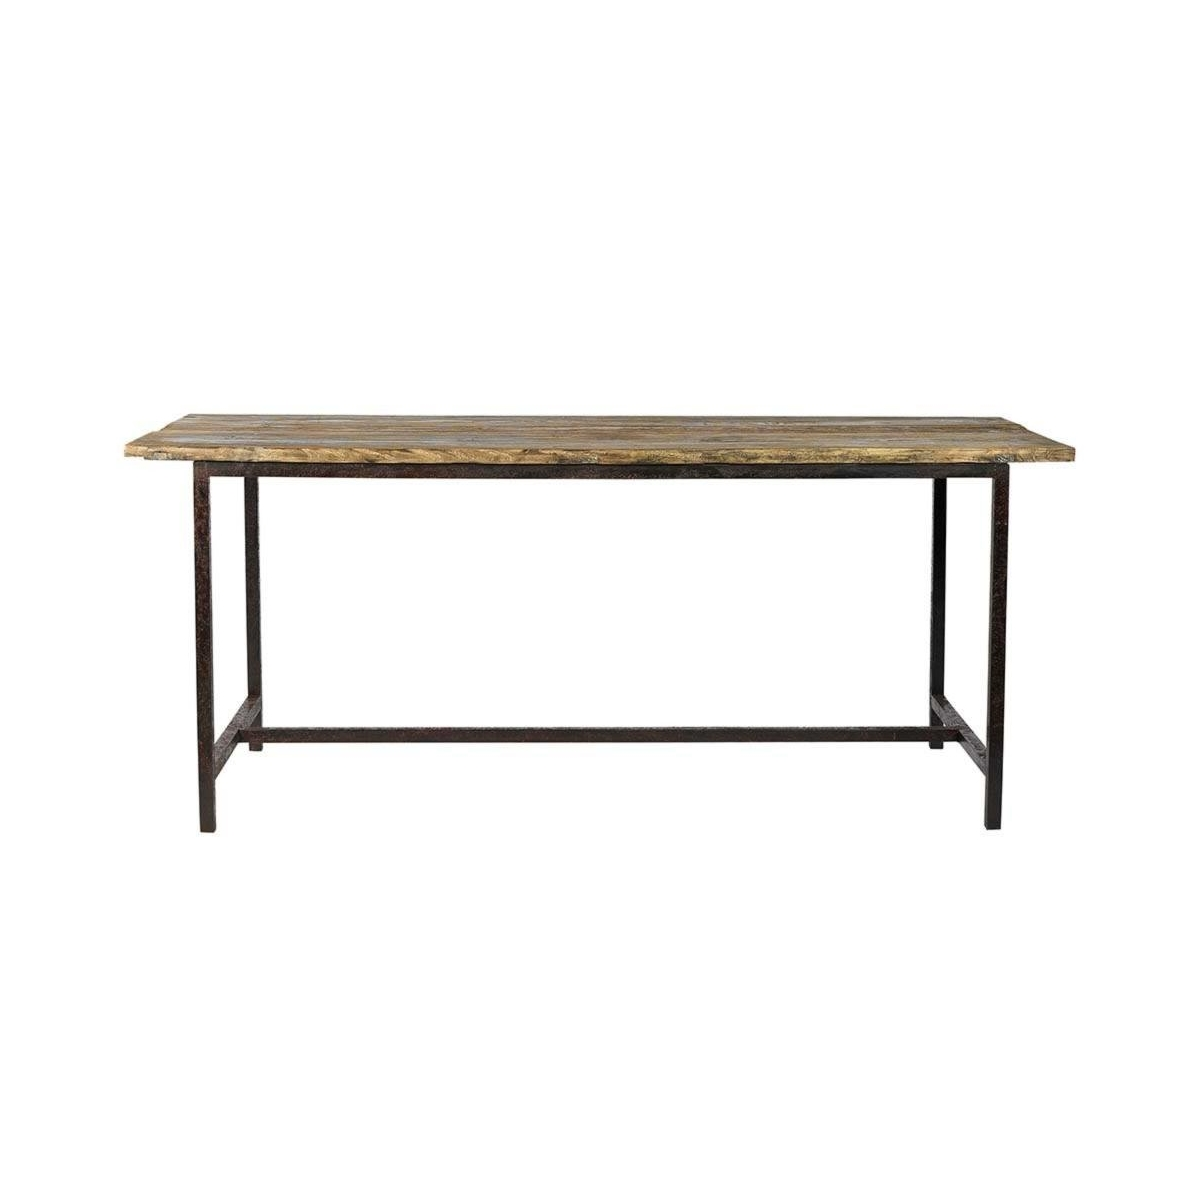 Matbord RAW 180 cm, Nordal